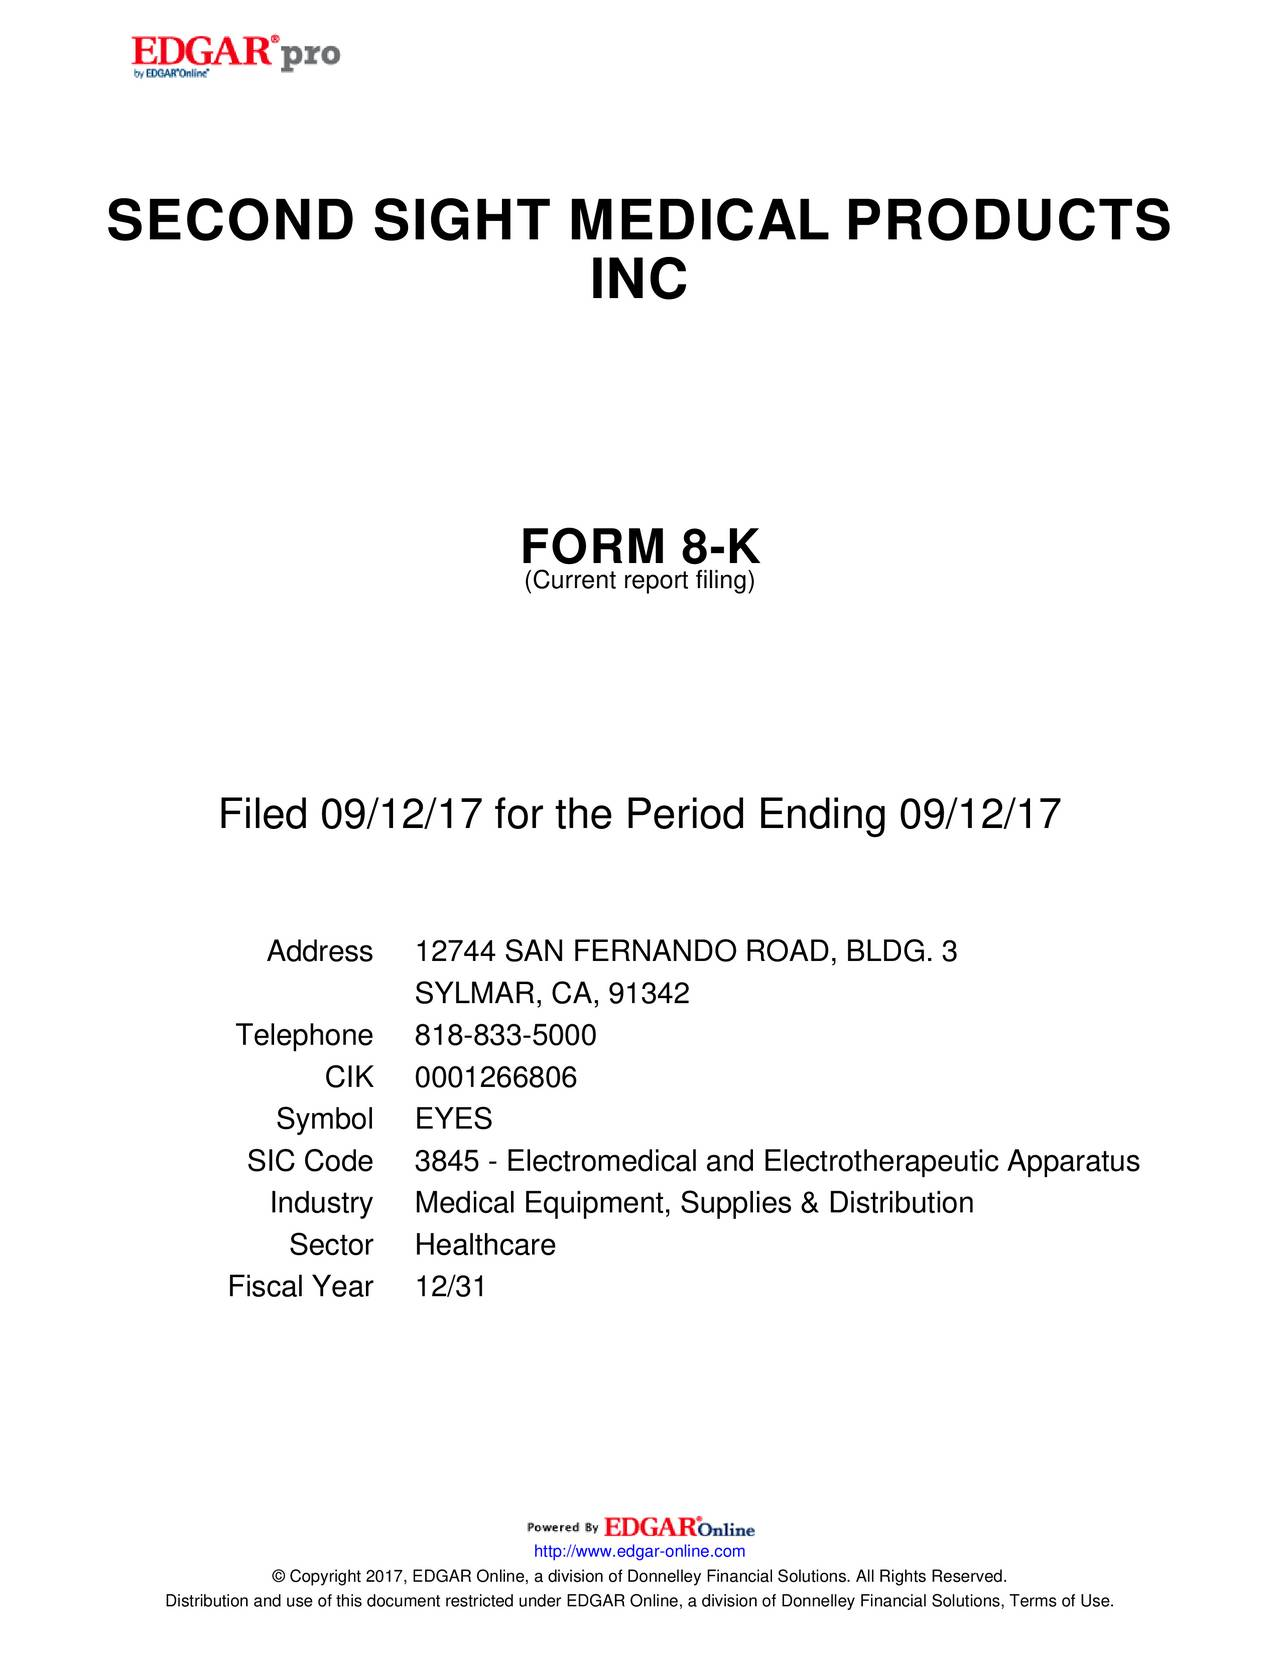 Second sight medical products eyes investor presentation k 8 mro ilif tr oper t nerr uc 71 2 90 biocorpaavc Choice Image